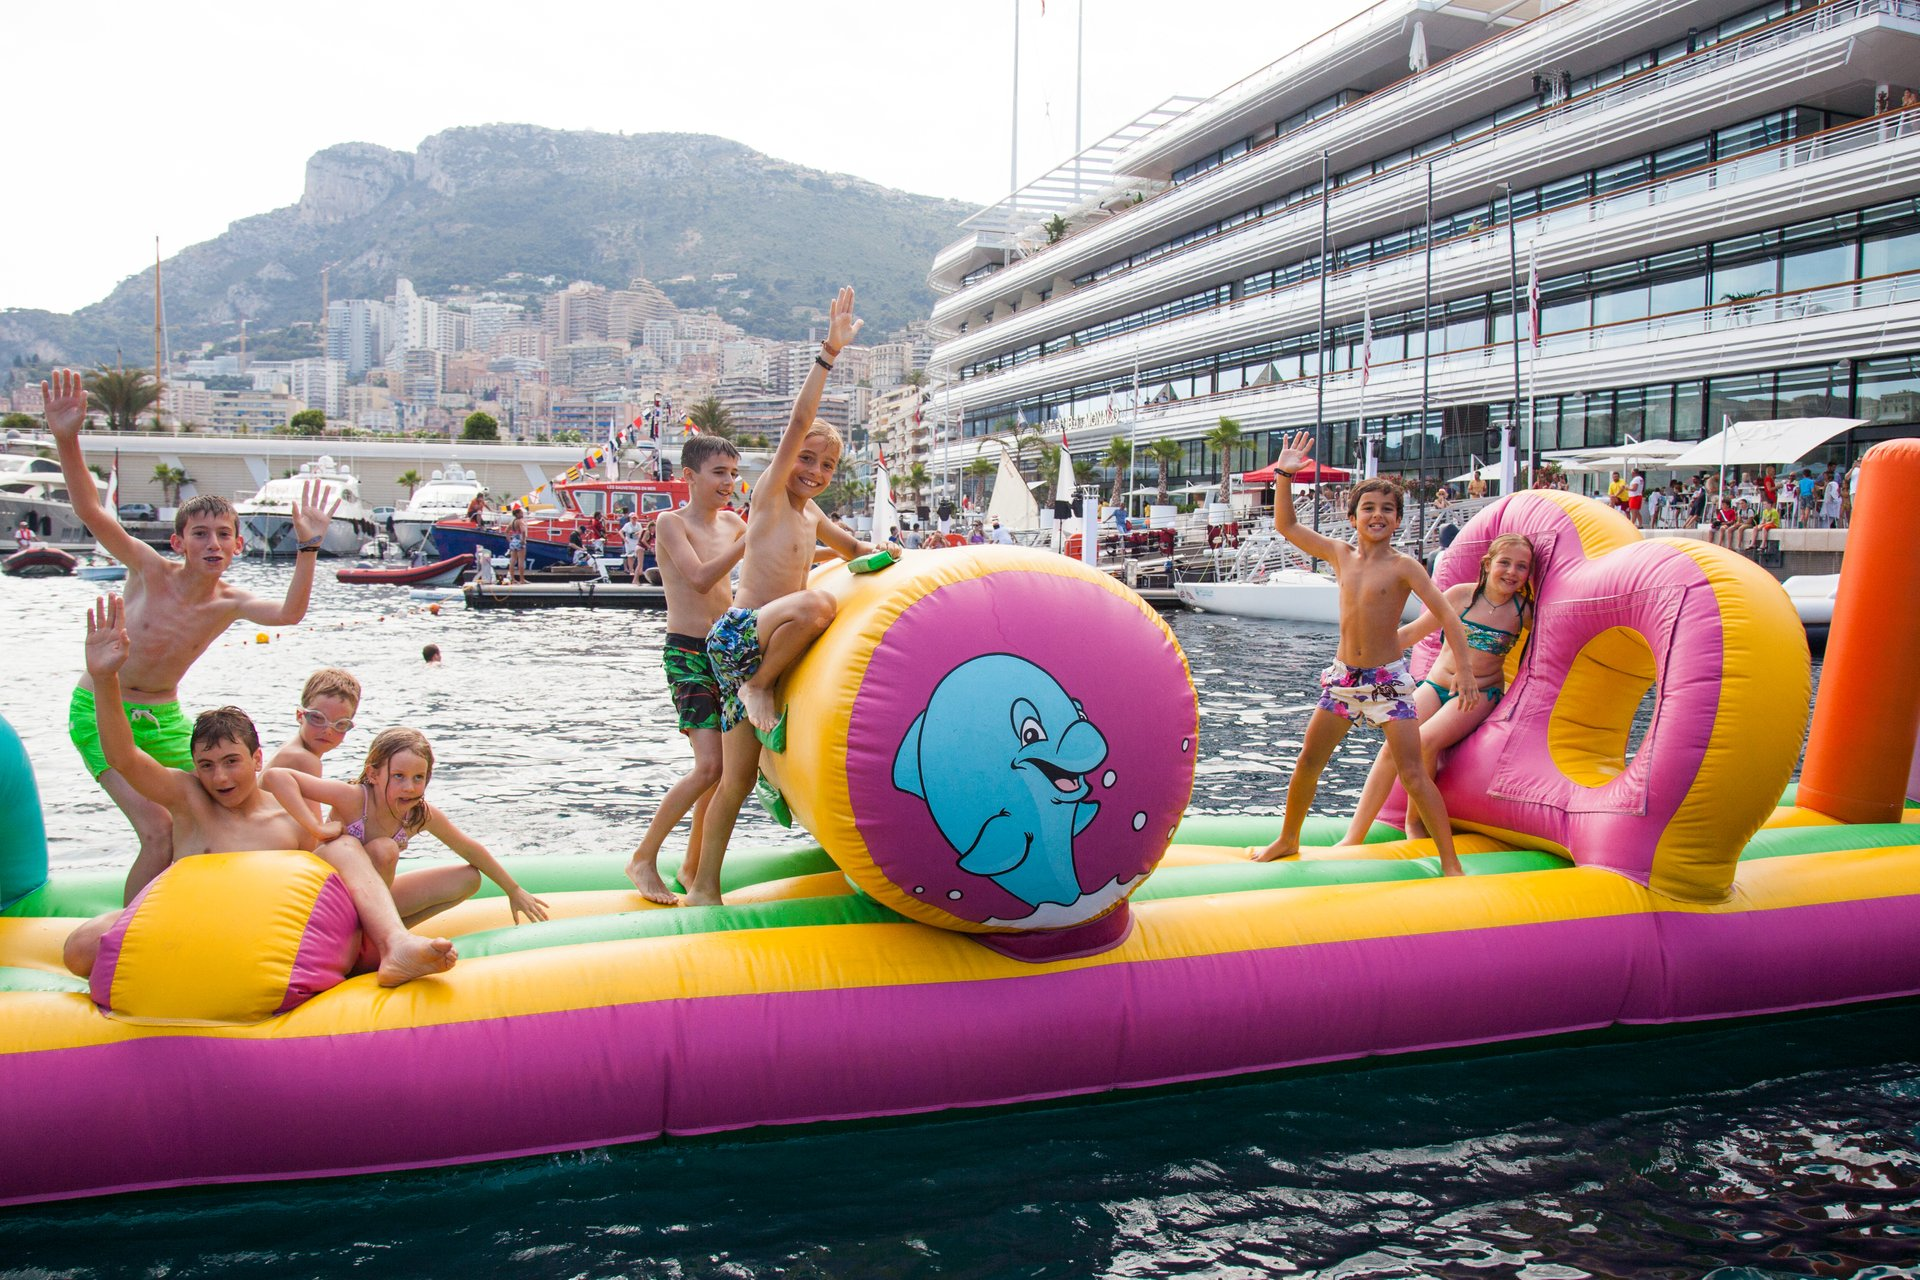 Best time to see Fête de la Mer (Festival of the Sea) 2019